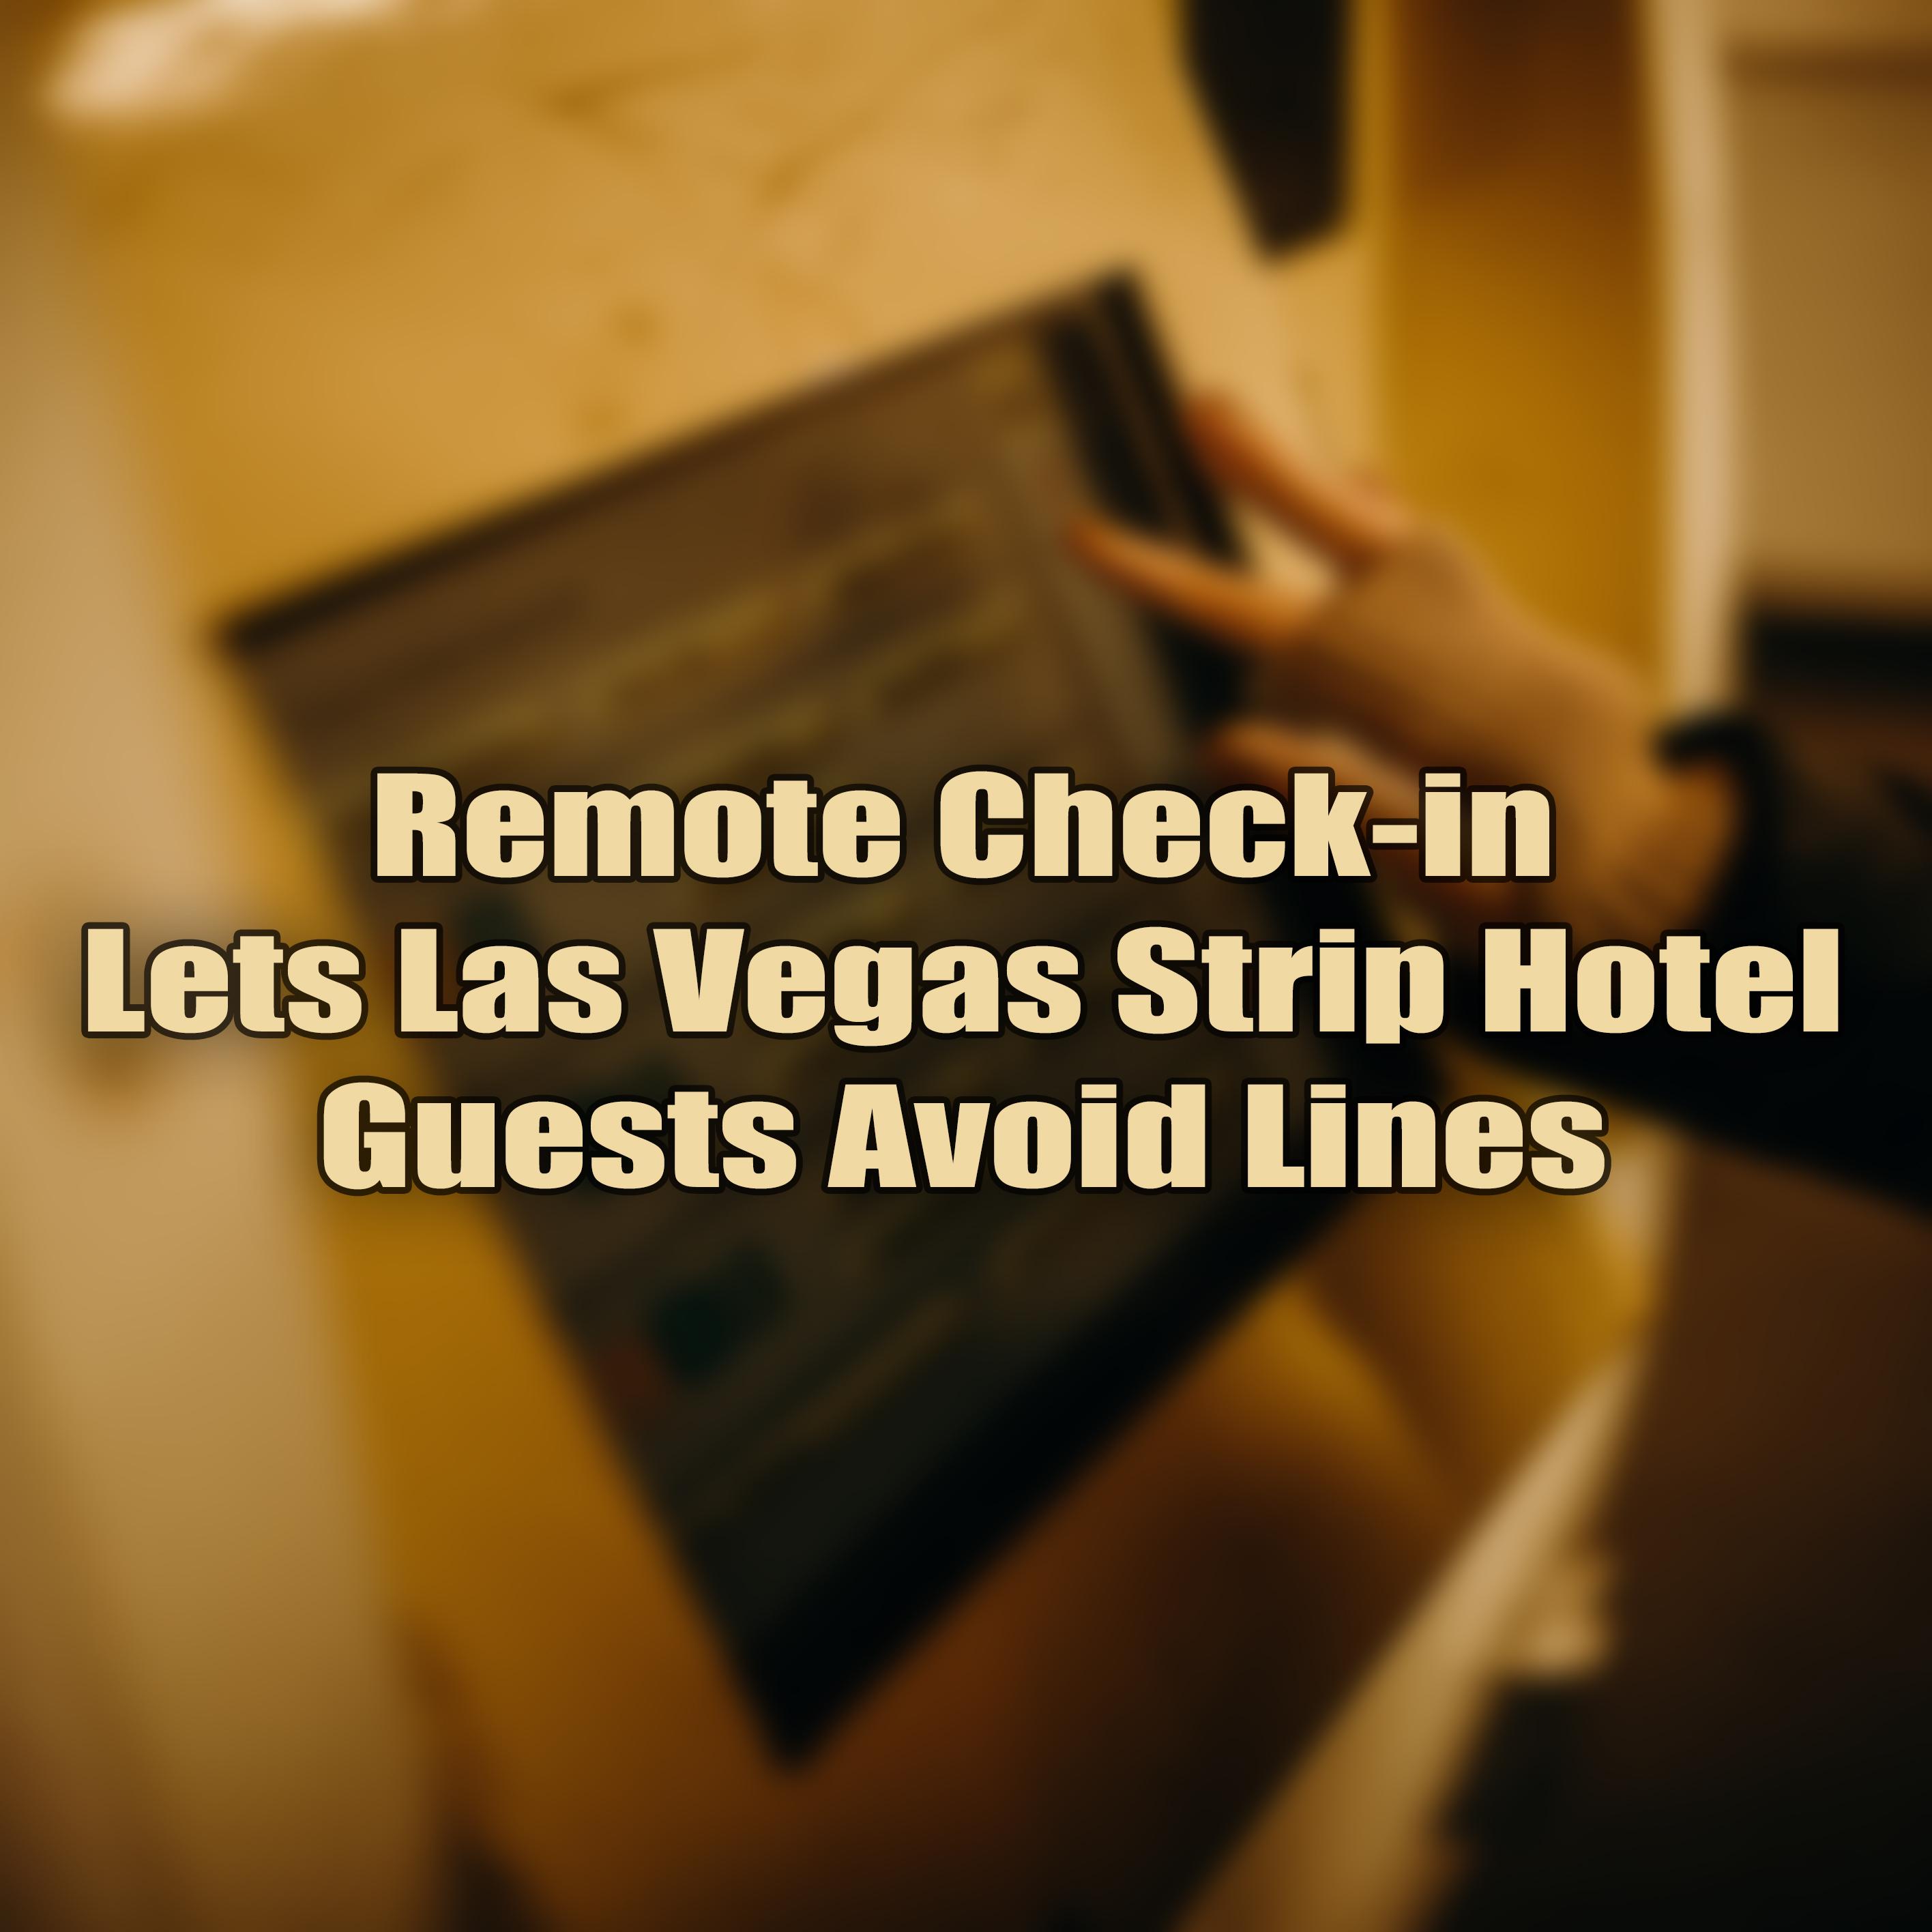 Remote Check ins in Las Vegas.jpg